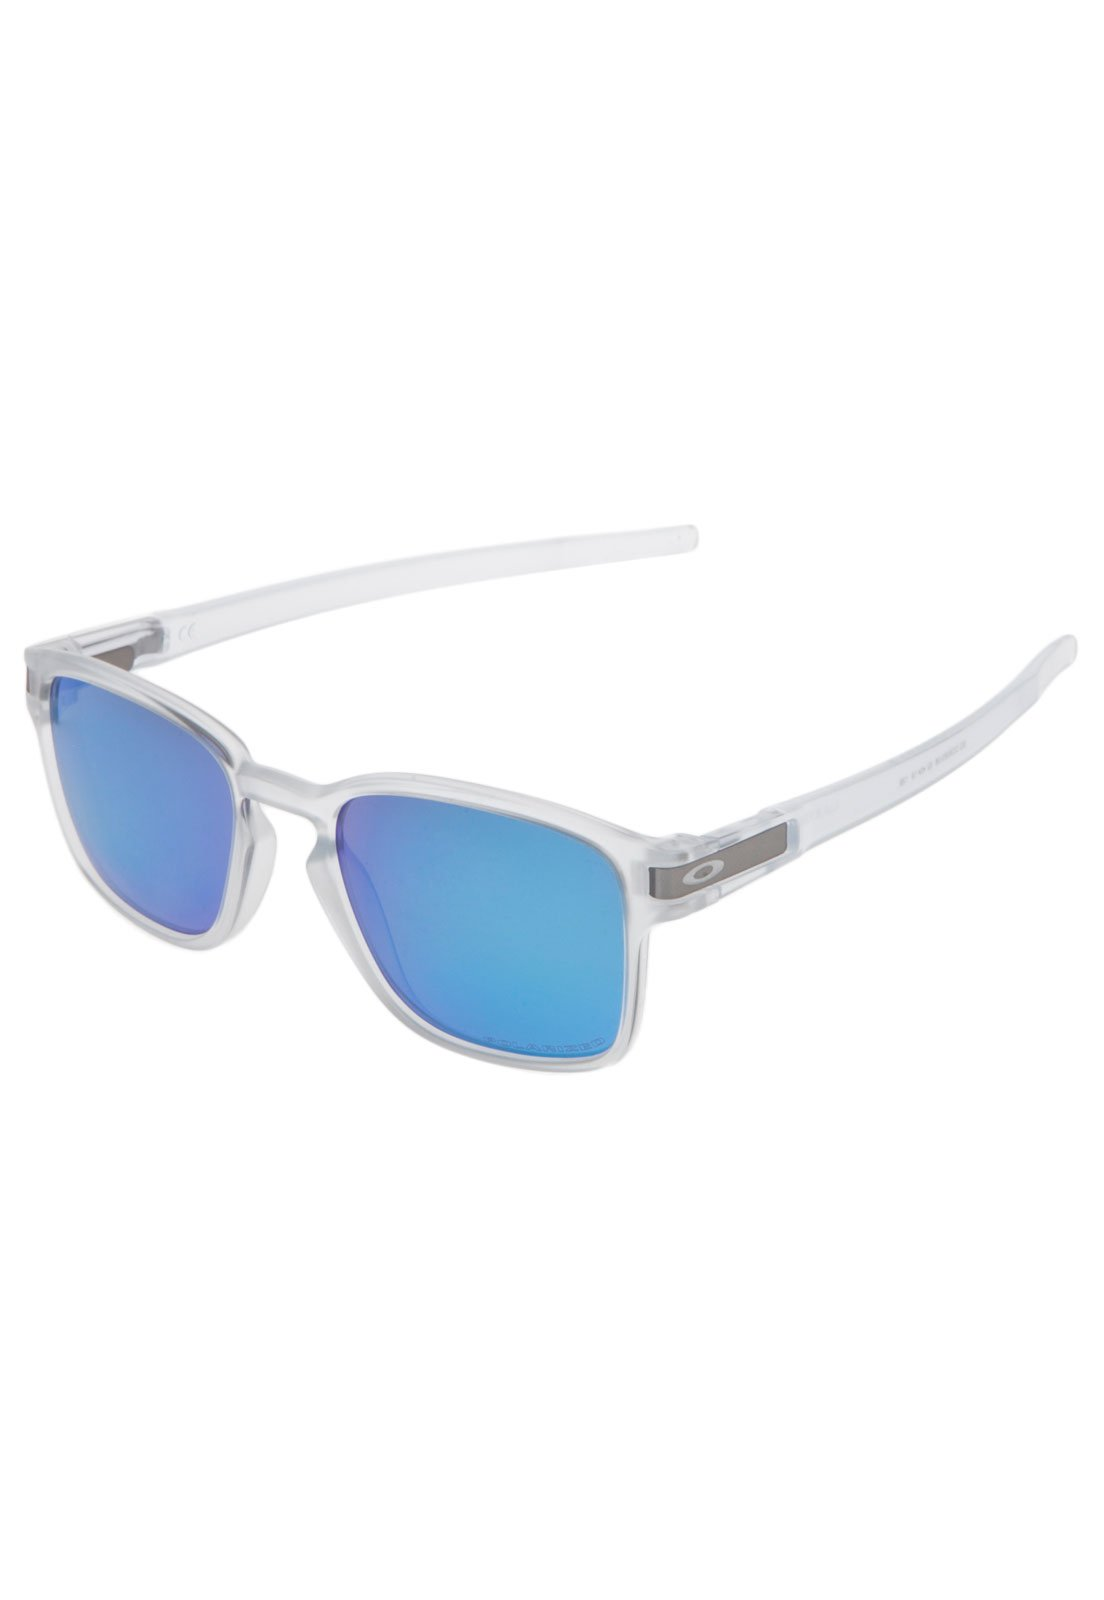 Óculos de Sol Oakley Latch SQ Azul - Compre Agora   Kanui Brasil 26c12aa4c1